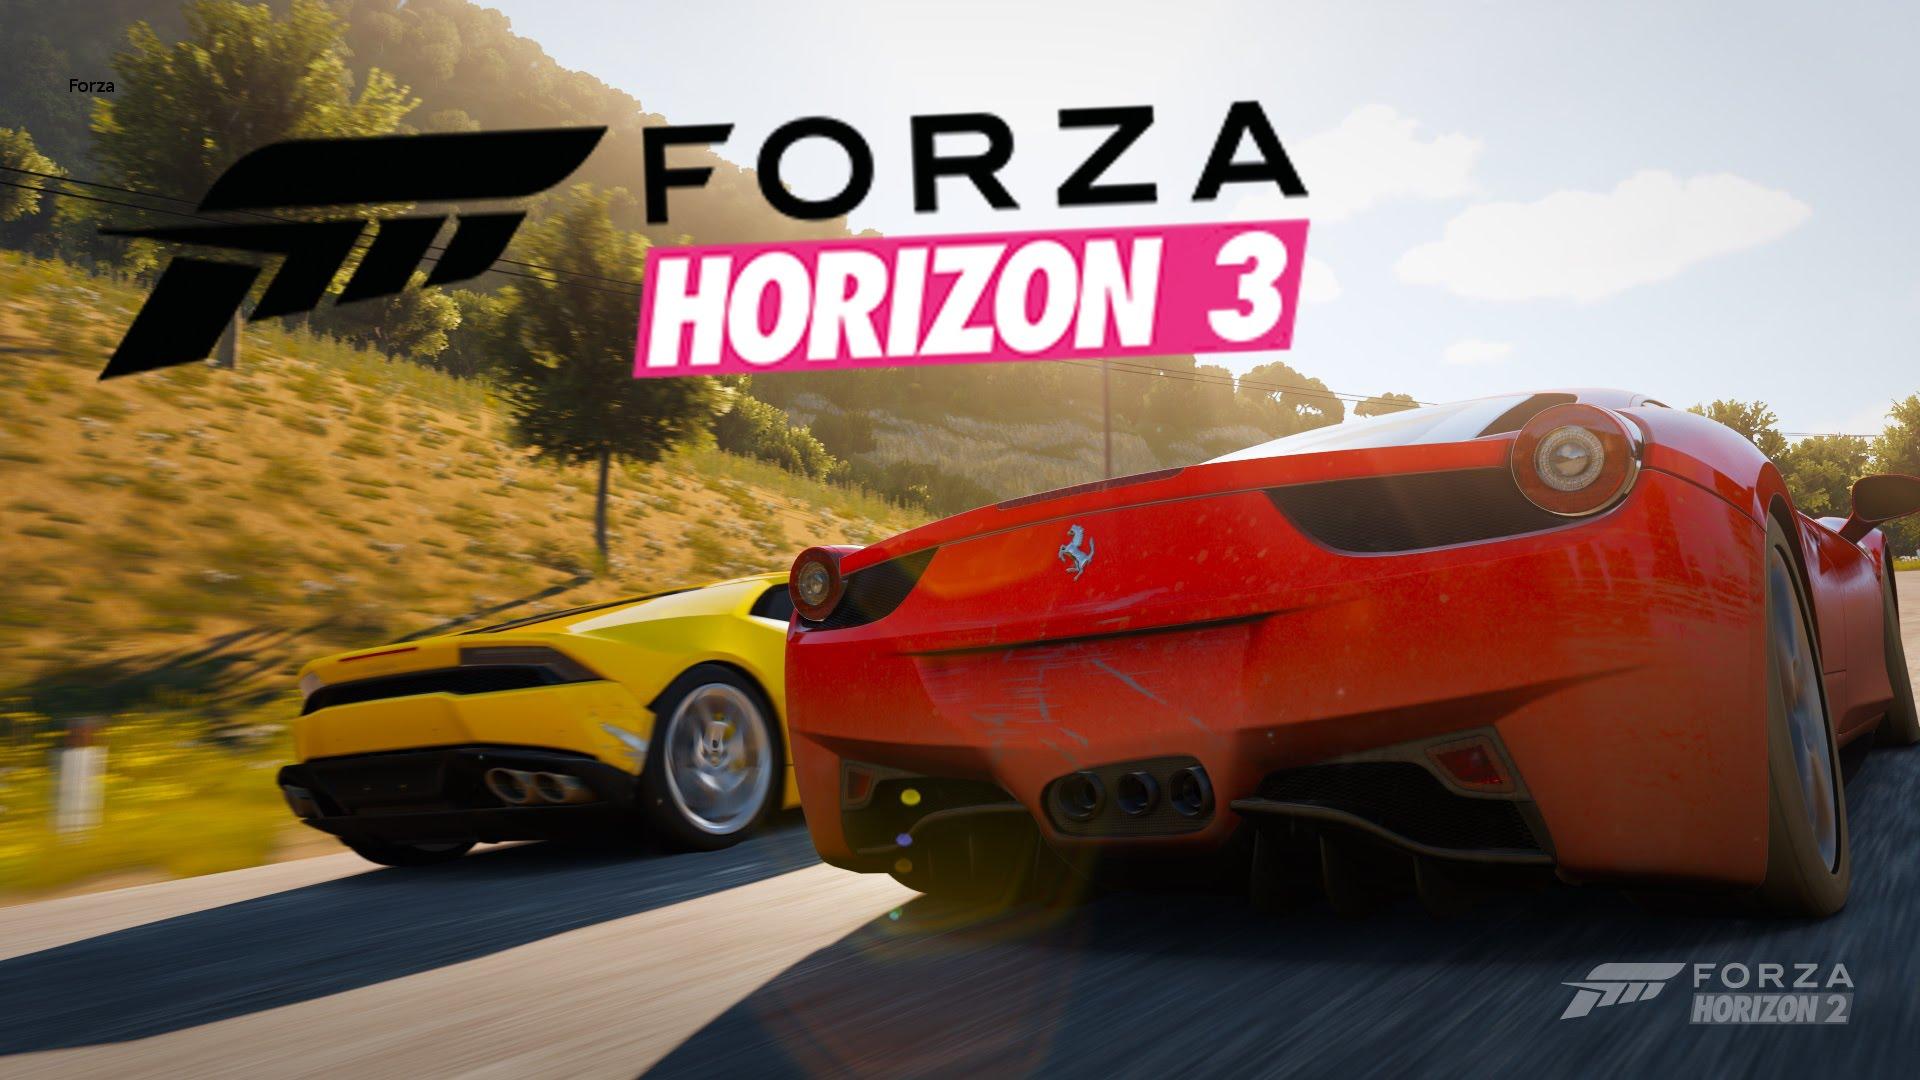 Forza Horizon 3 Backgrounds